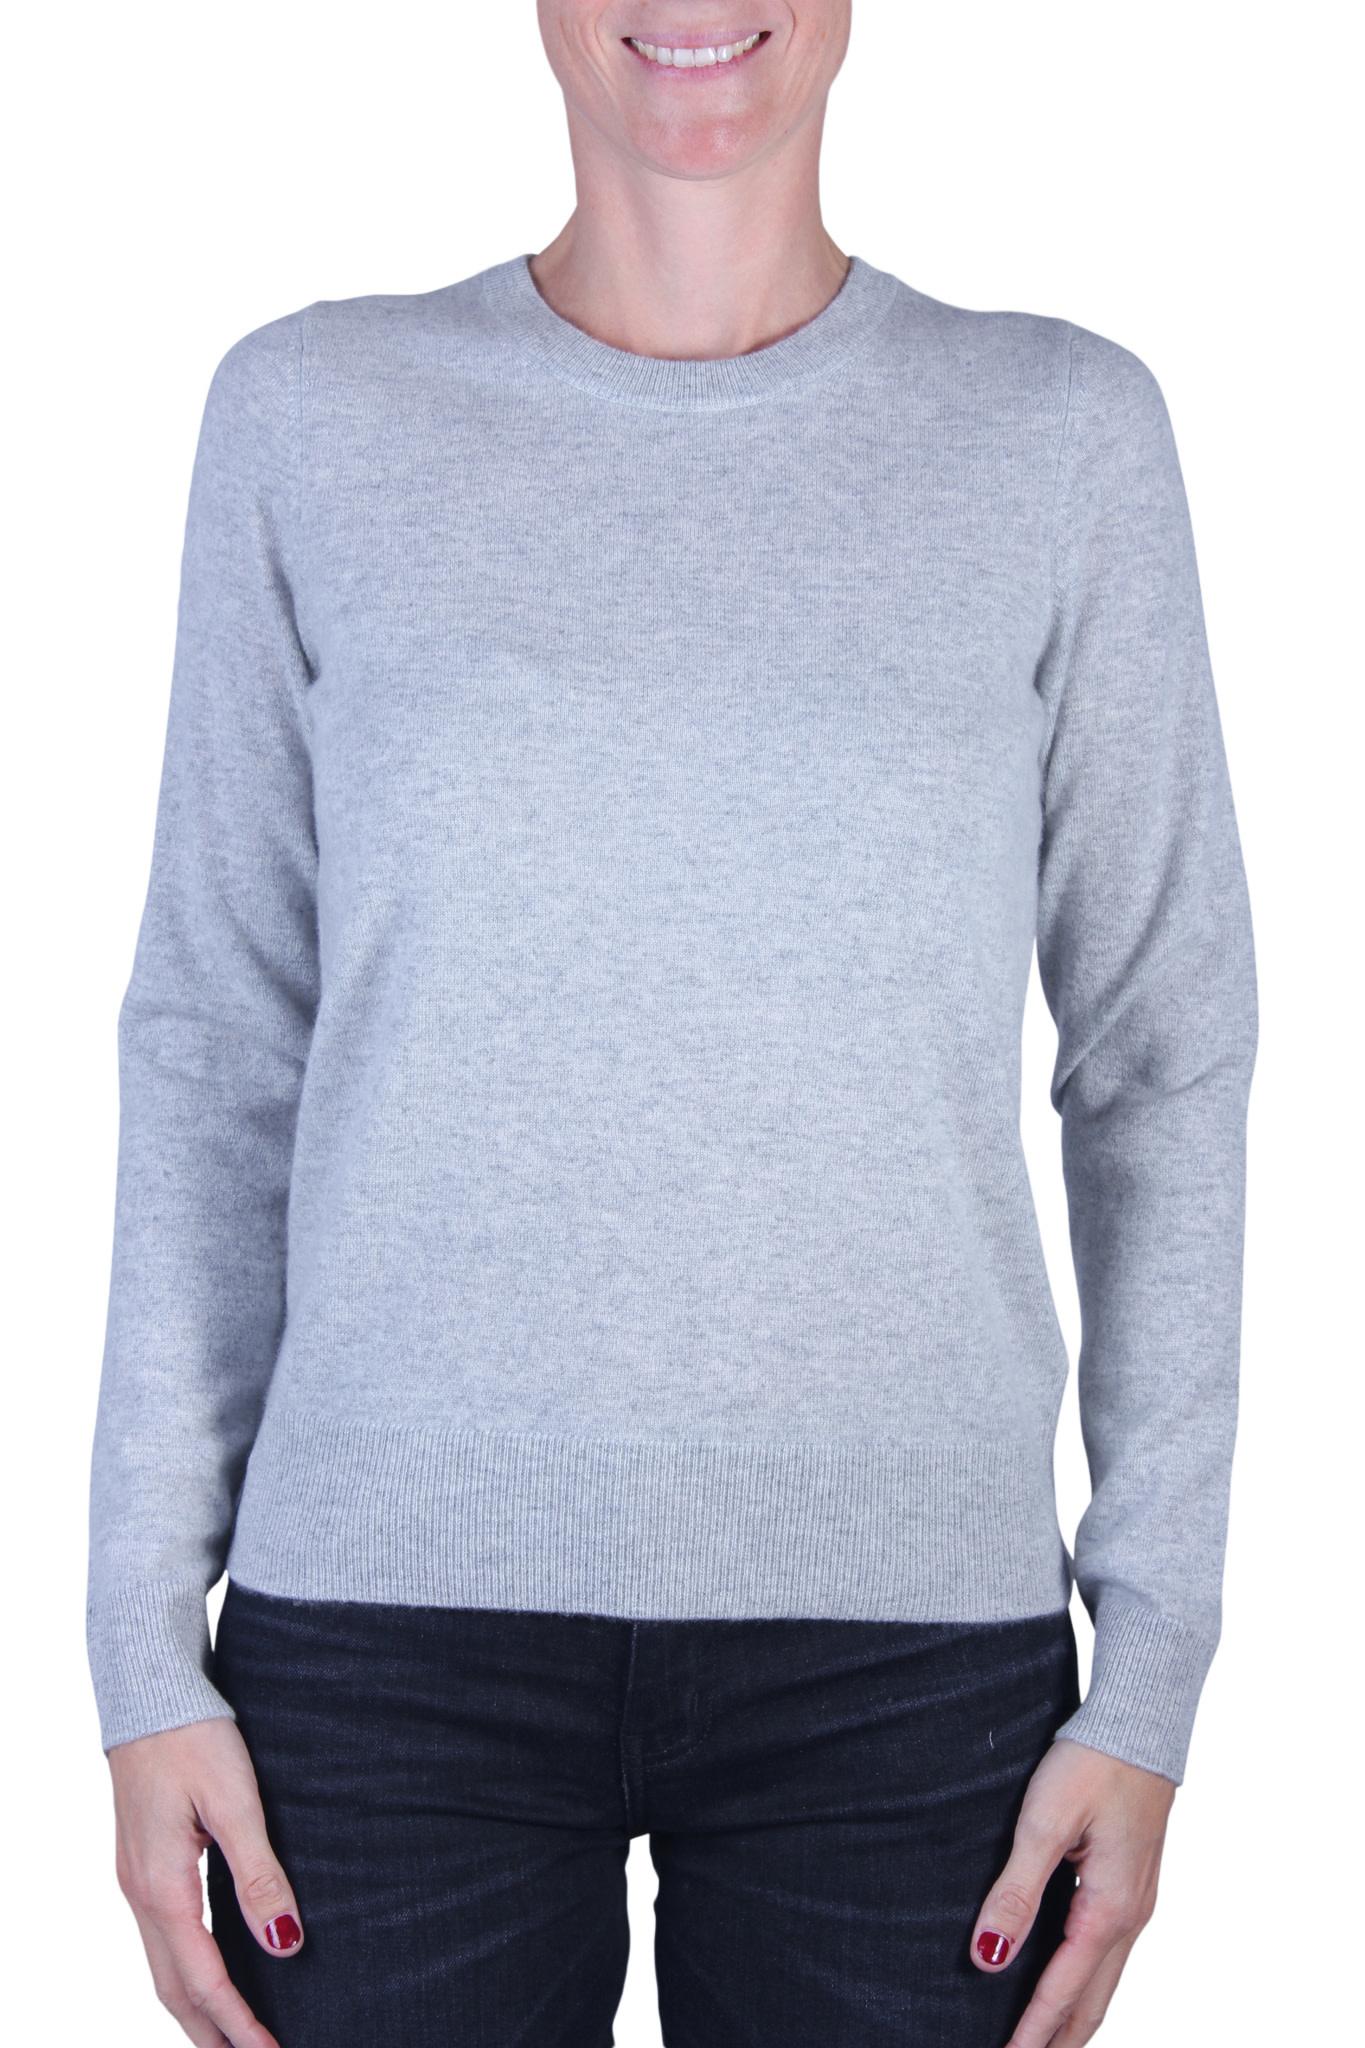 Repeat Sweater 100413-5